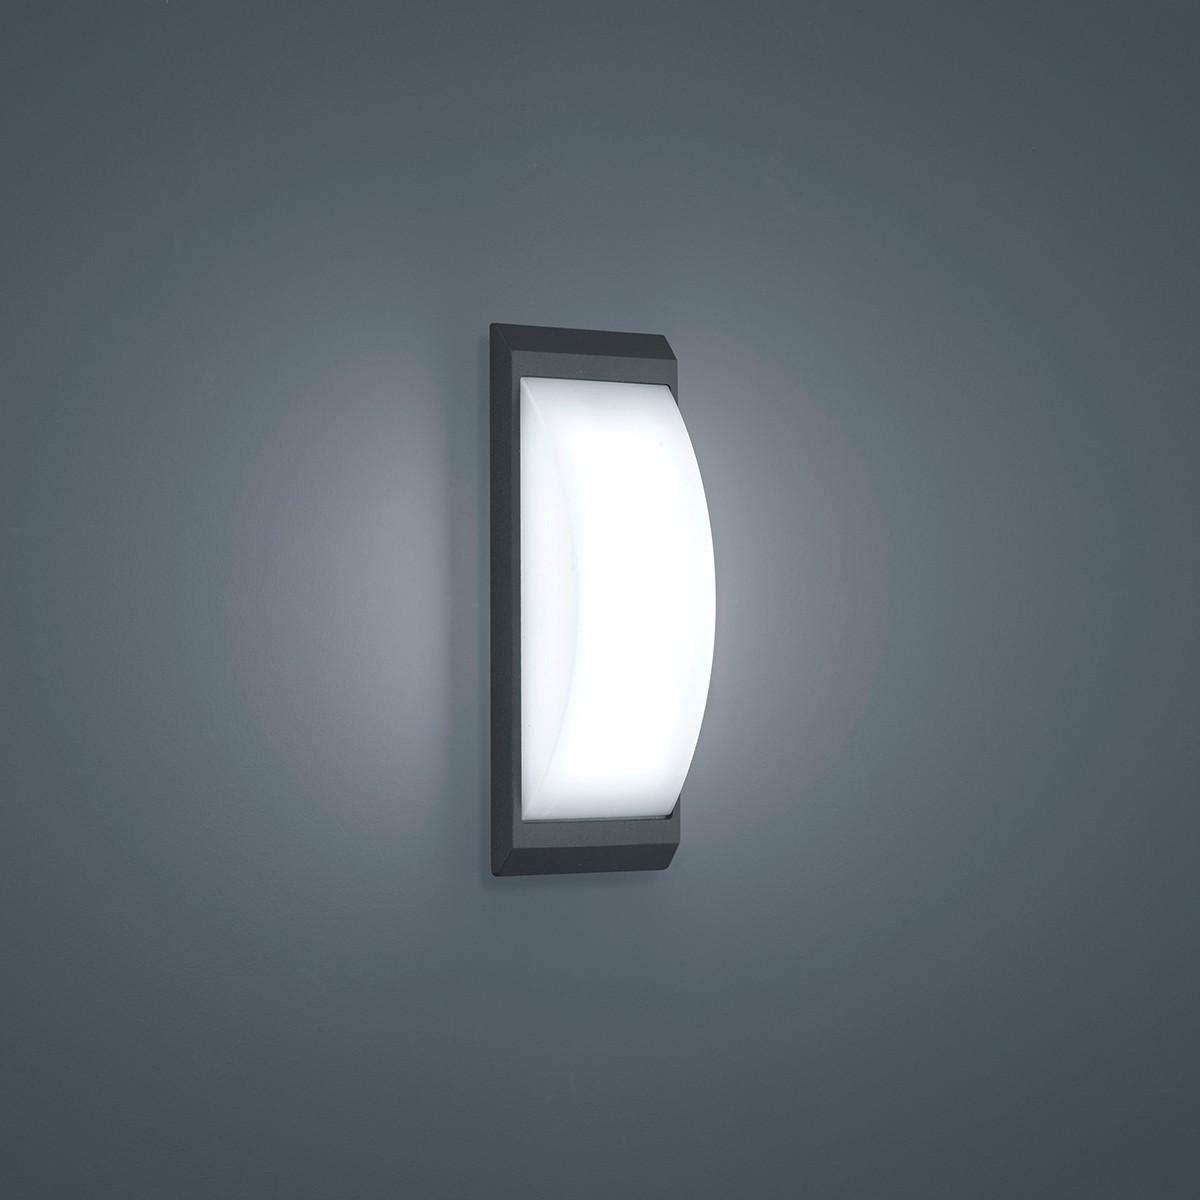 Helestra Kapo LED Außenwandleuchte, graphit